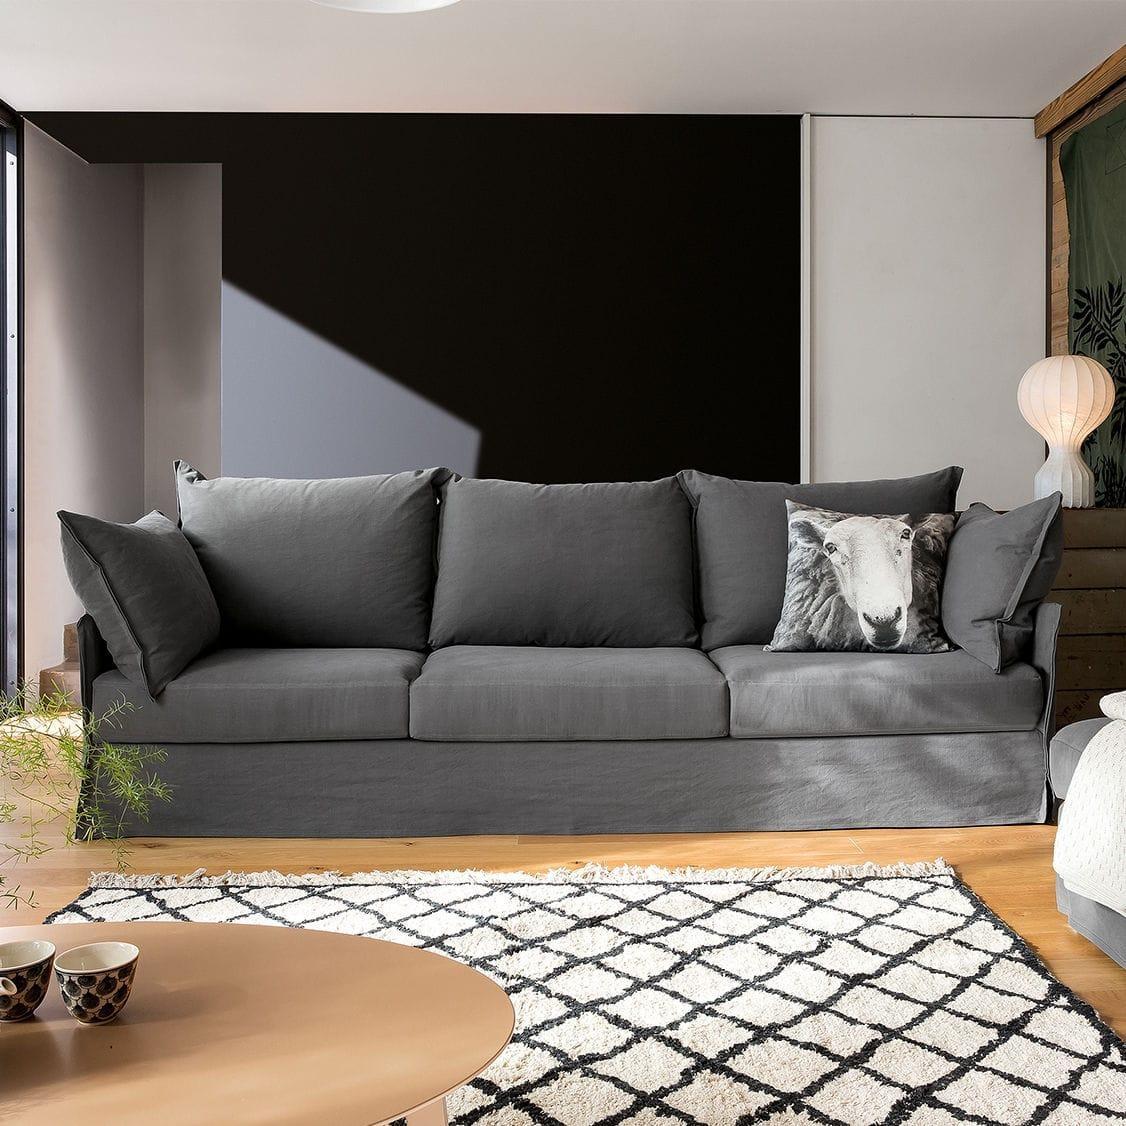 Modular Sofa / Contemporary / 3 Seater / With Removable Cover Inside Sofas With Removable Covers (Image 10 of 20)